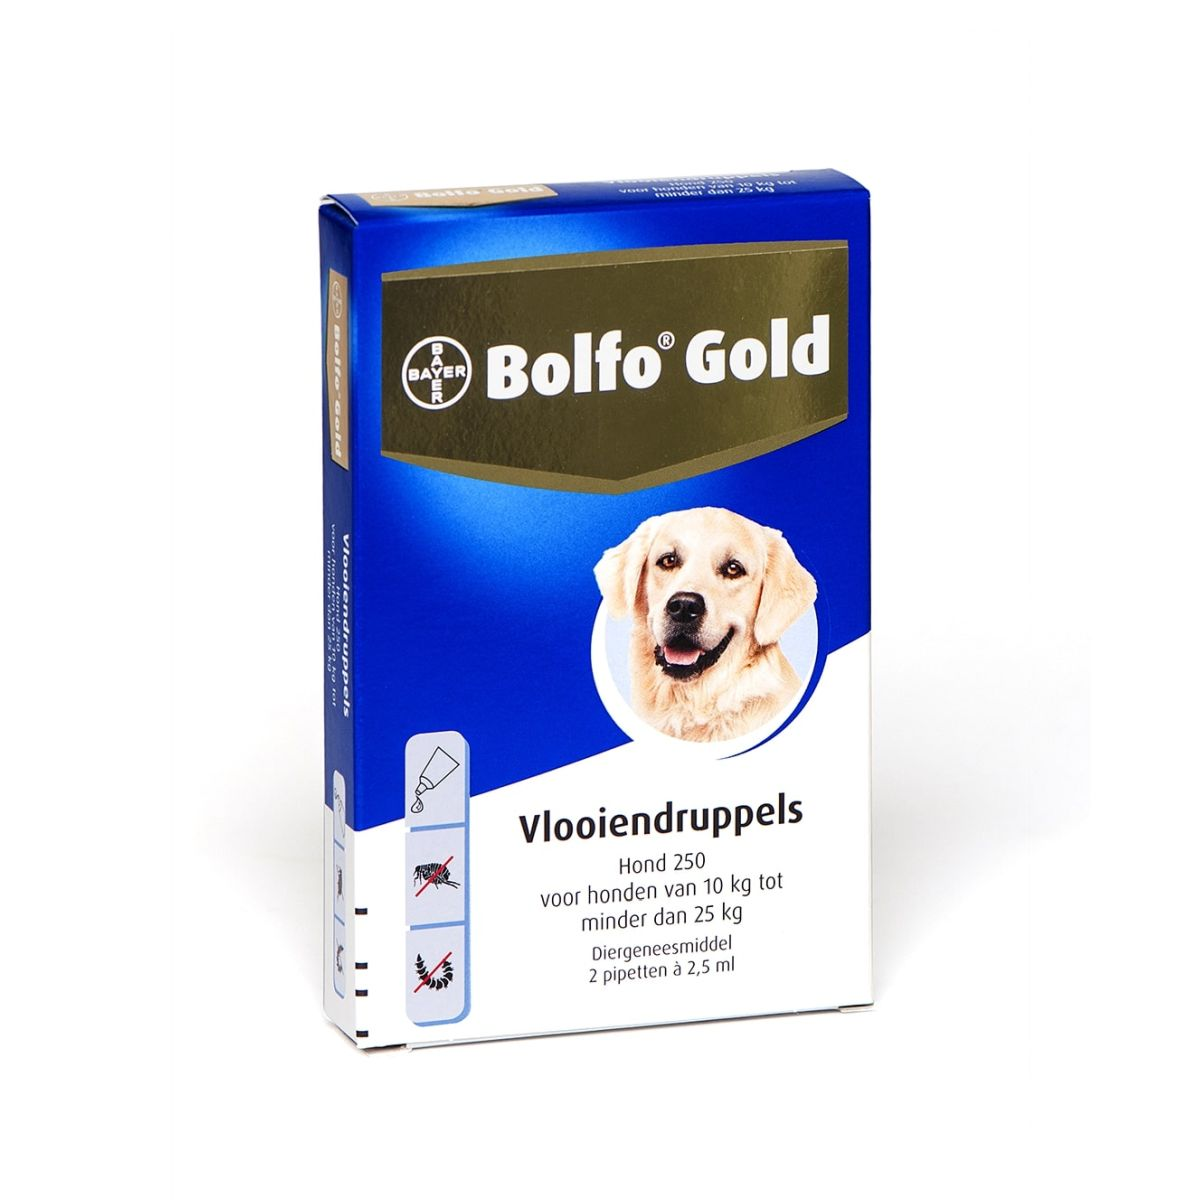 BA BOLFO GOLD HOND 250 2PIP 00001